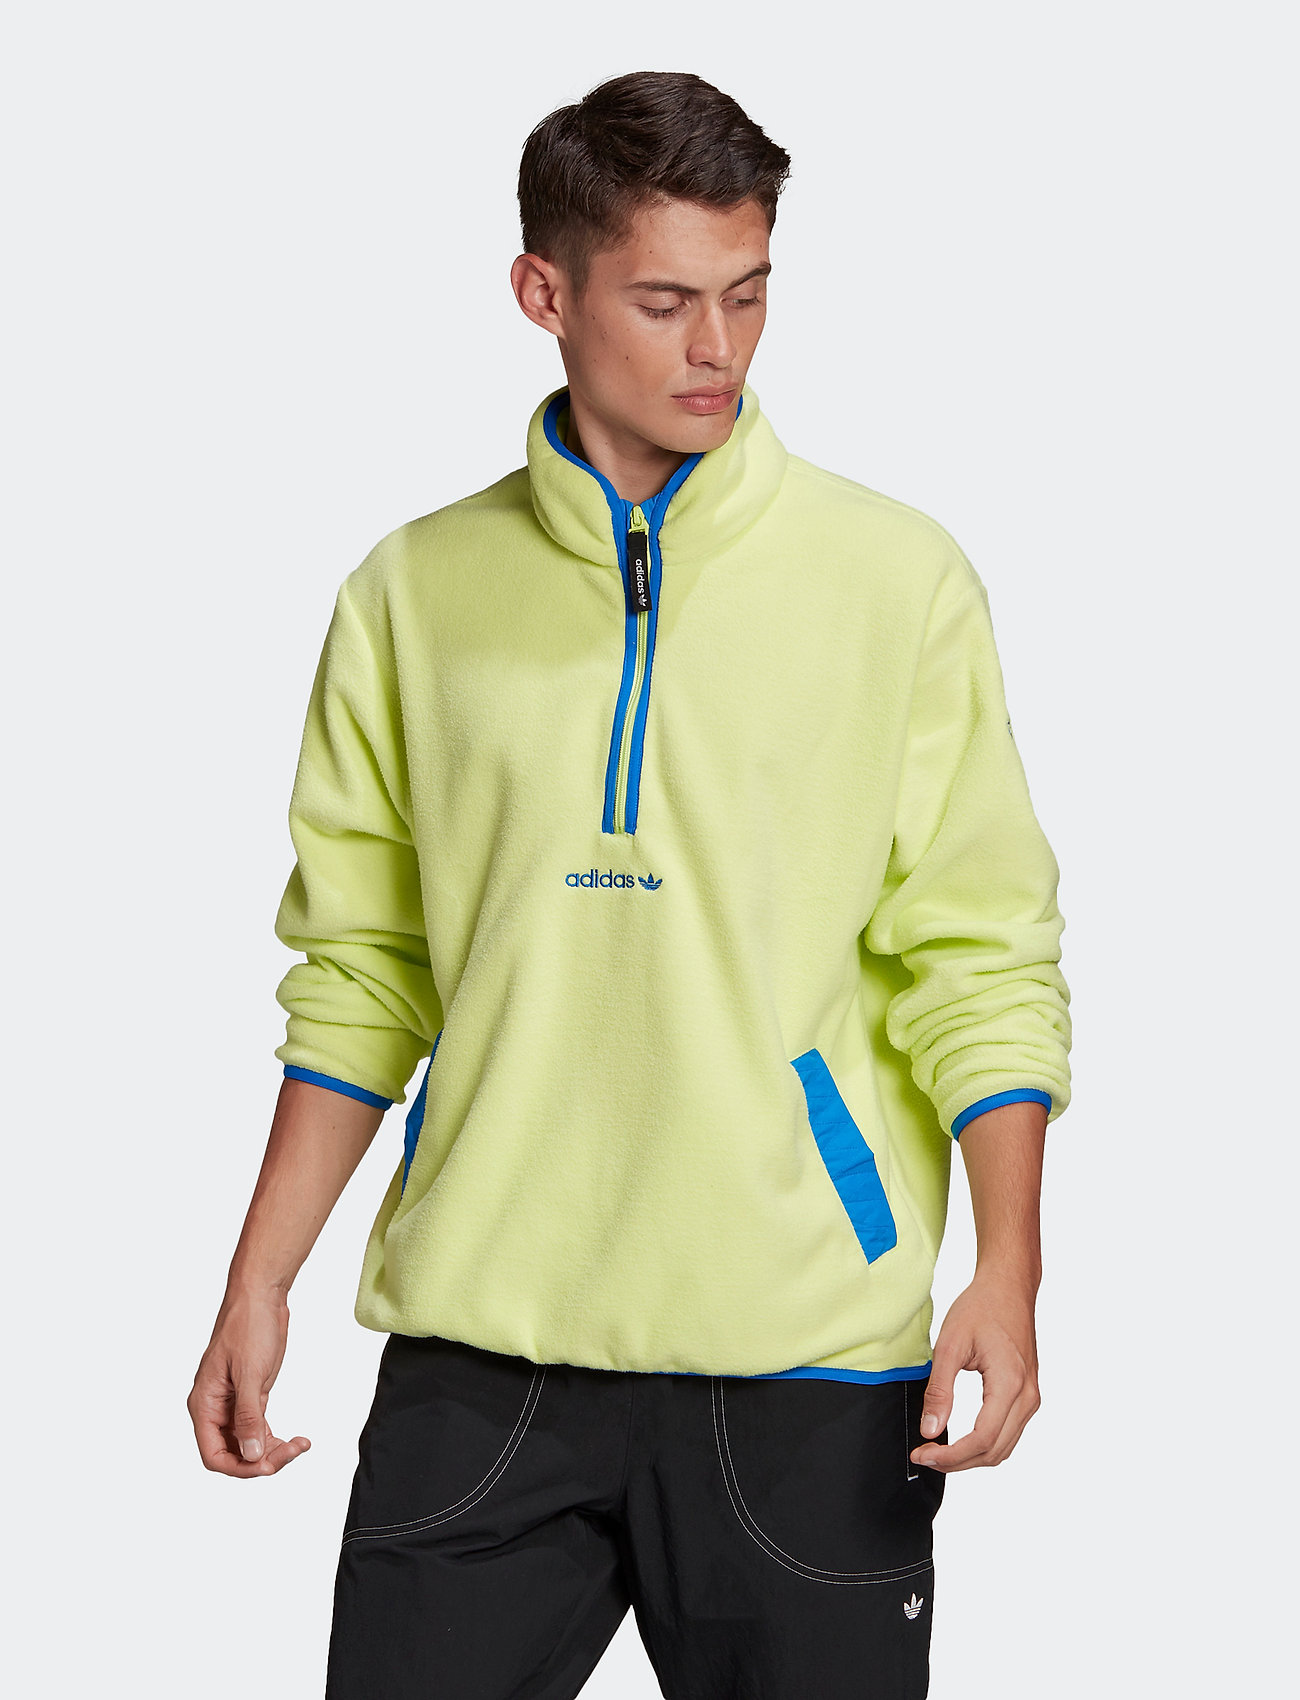 adidas Originals - Adventure Polar Fleece Half-Zip Sweatshirt - basic-sweatshirts - sefrye - 0